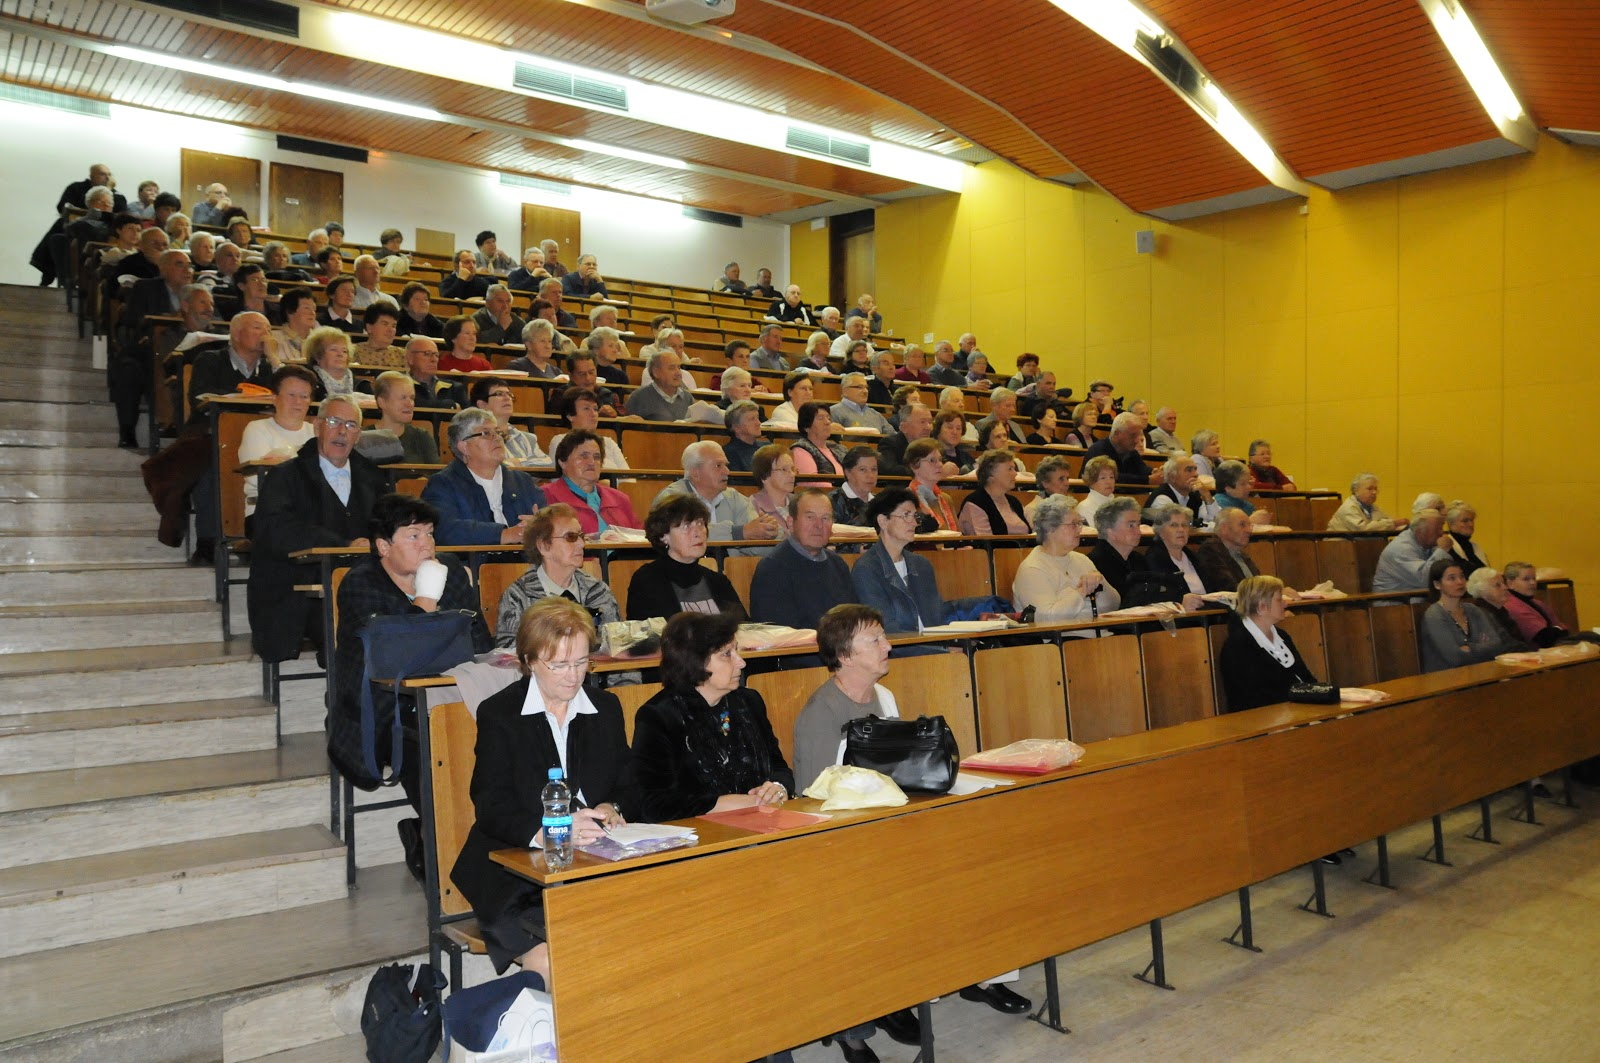 Predavanje, dr. Camlek - oktober 2011 - DSC_3869.JPG